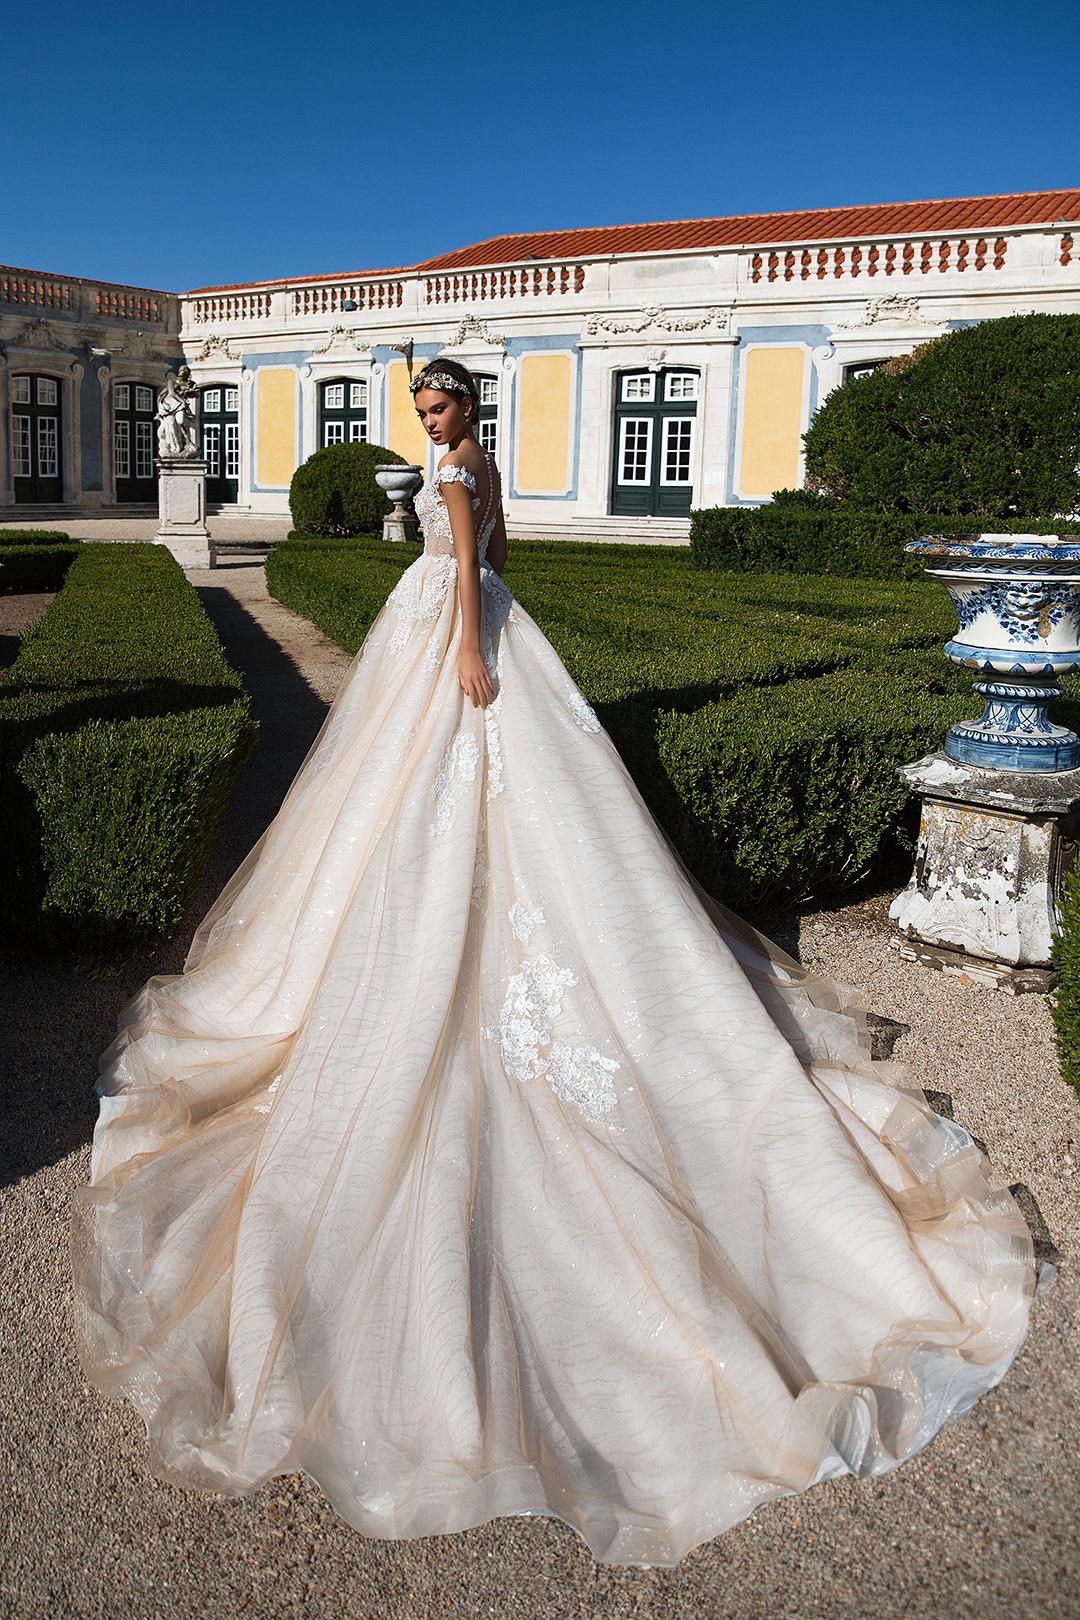 Blushing Bridal Boutique -Merion, Sintra Holidaysbridal-wedding-wedding gown-Mississauga-woodbridge-vaughan-toronto-gta-ontario-canada-montreal-buffalo-NYC-california